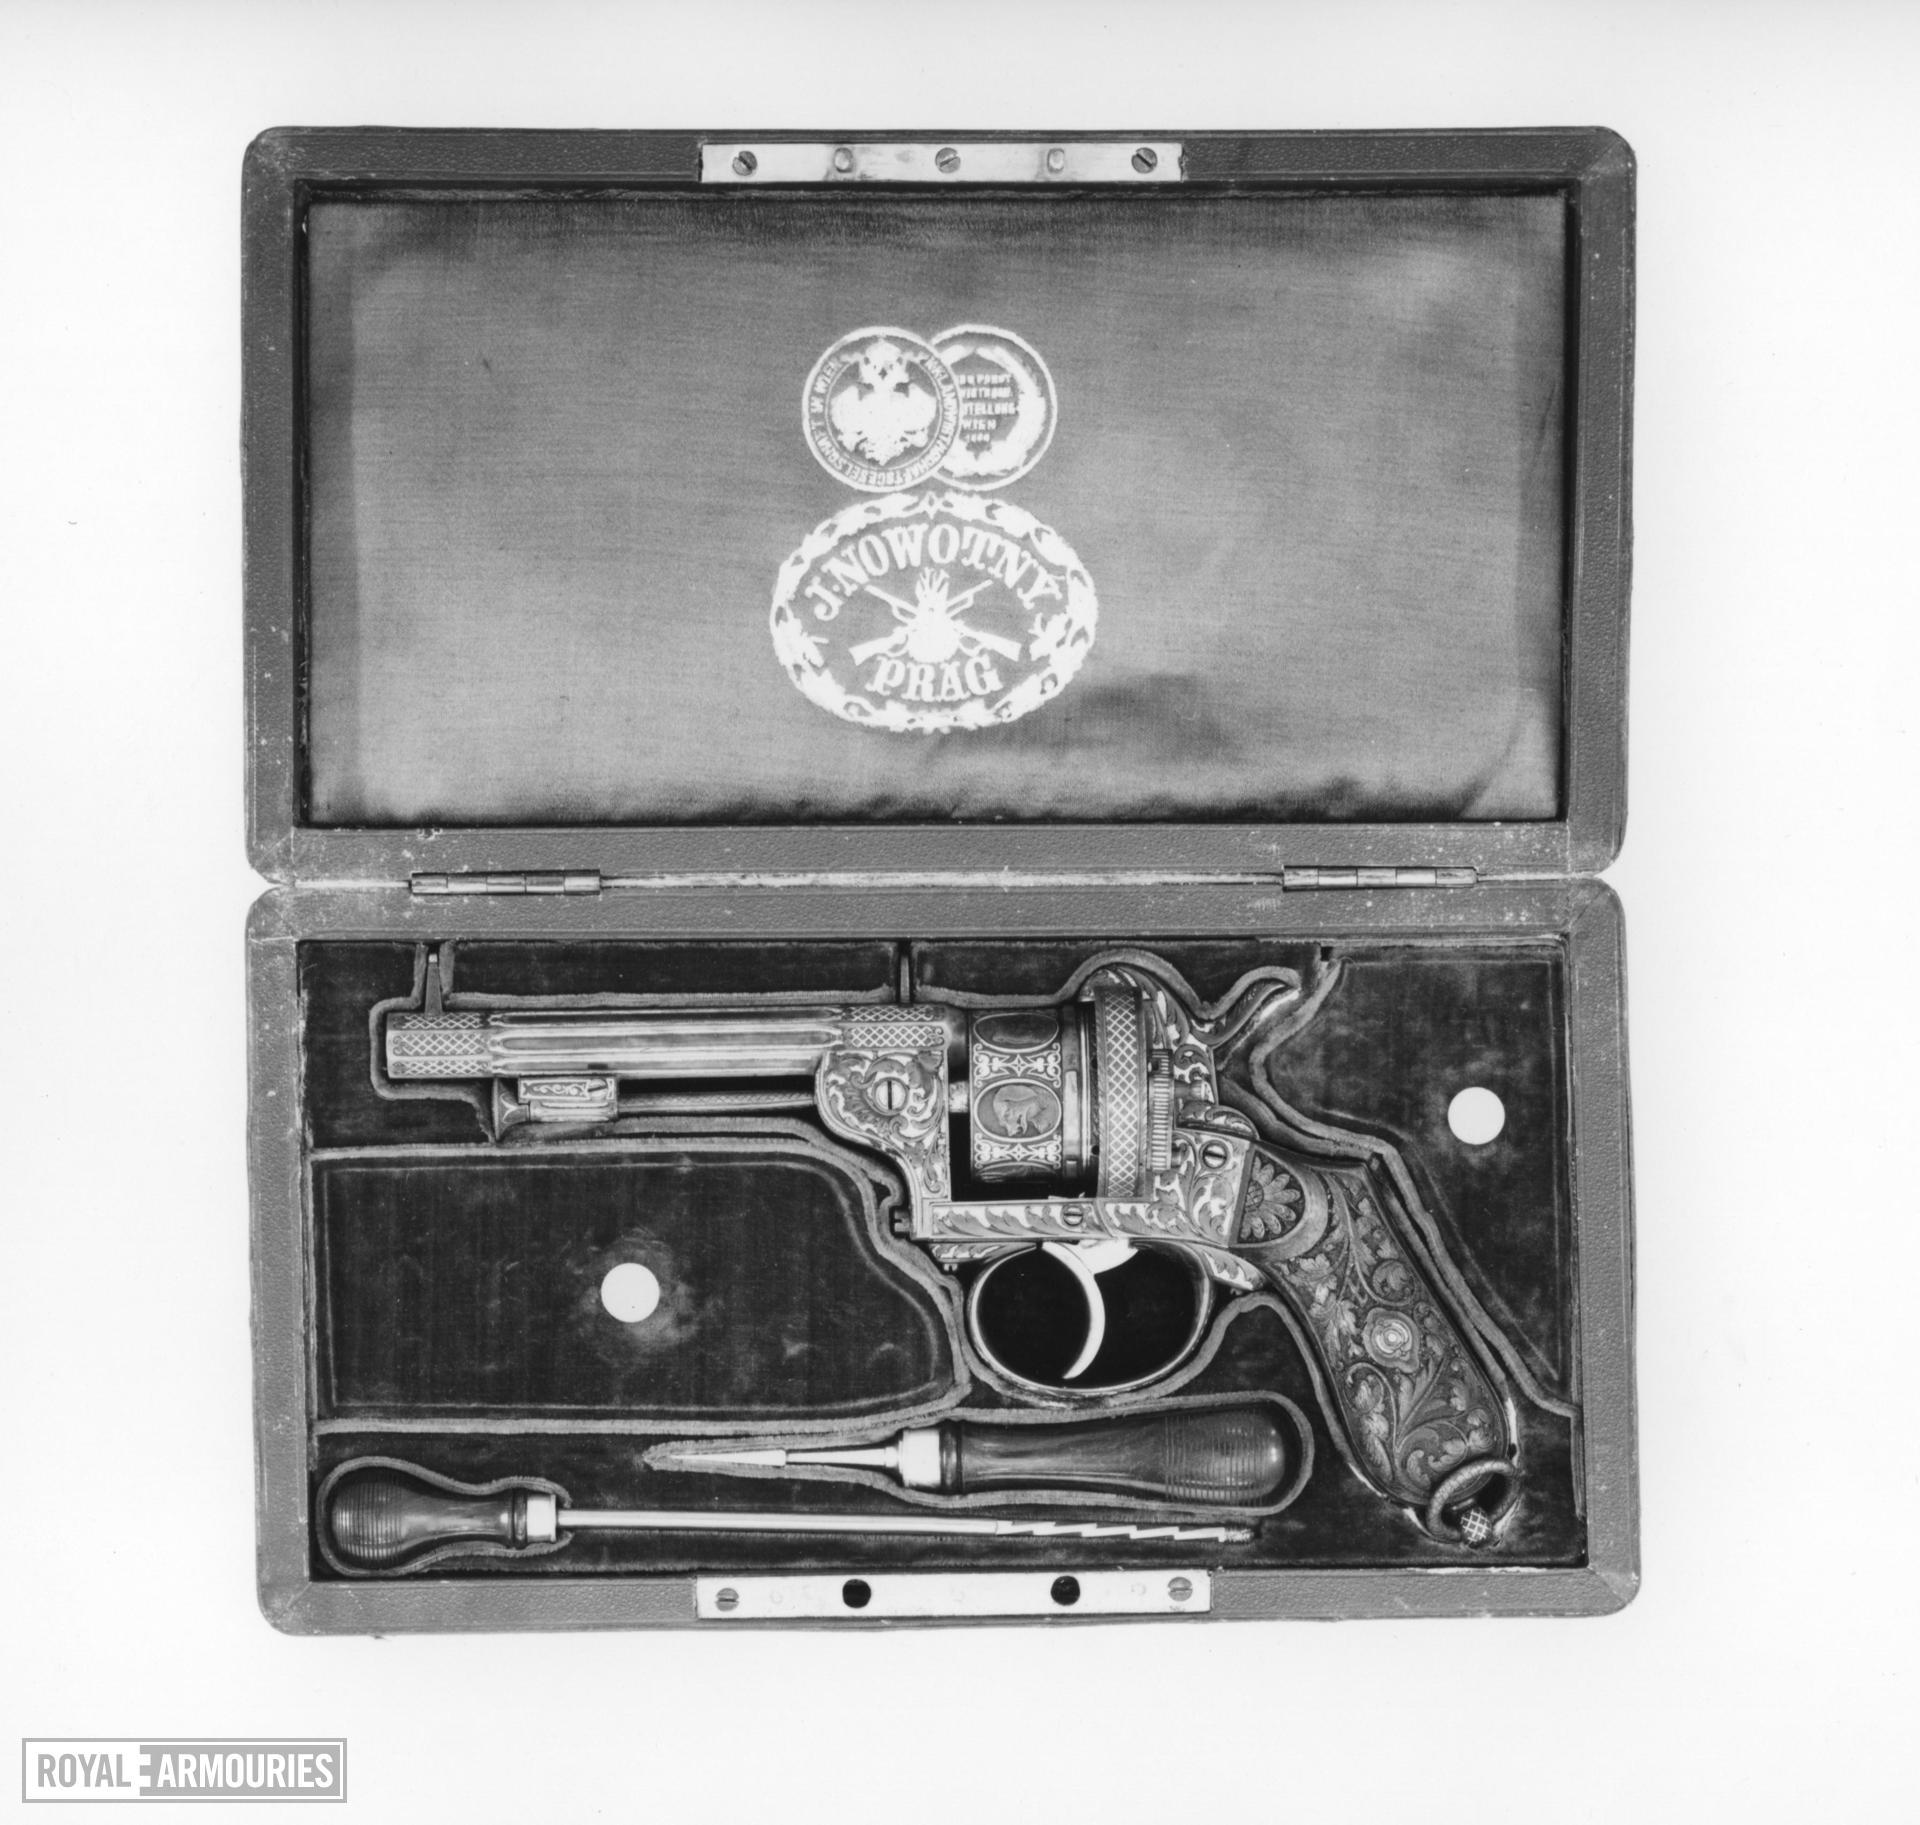 Pinfire six-shot revolver - Johann Novotny